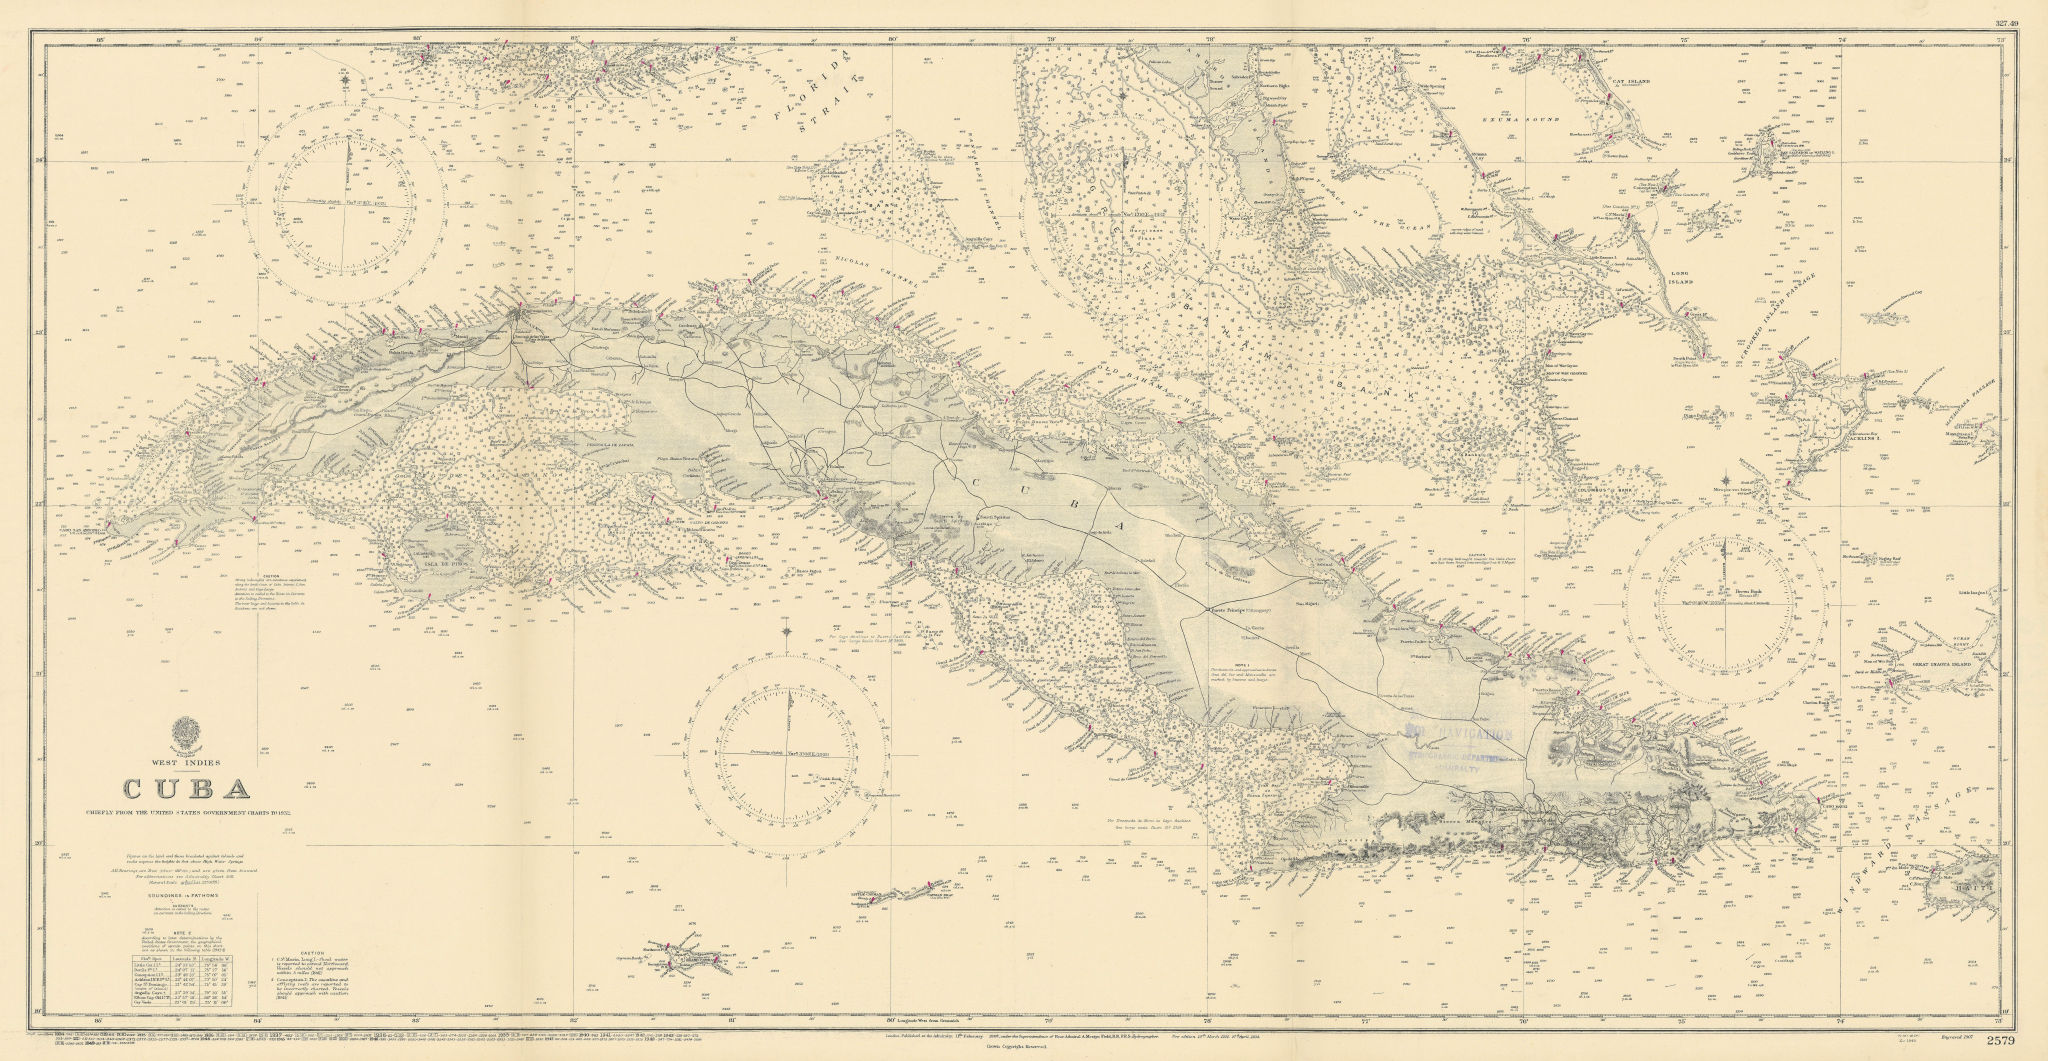 Cuba Bahamas Cayman Islands. Caribbean. ADMIRALTY sea chart 1907 (1949) map